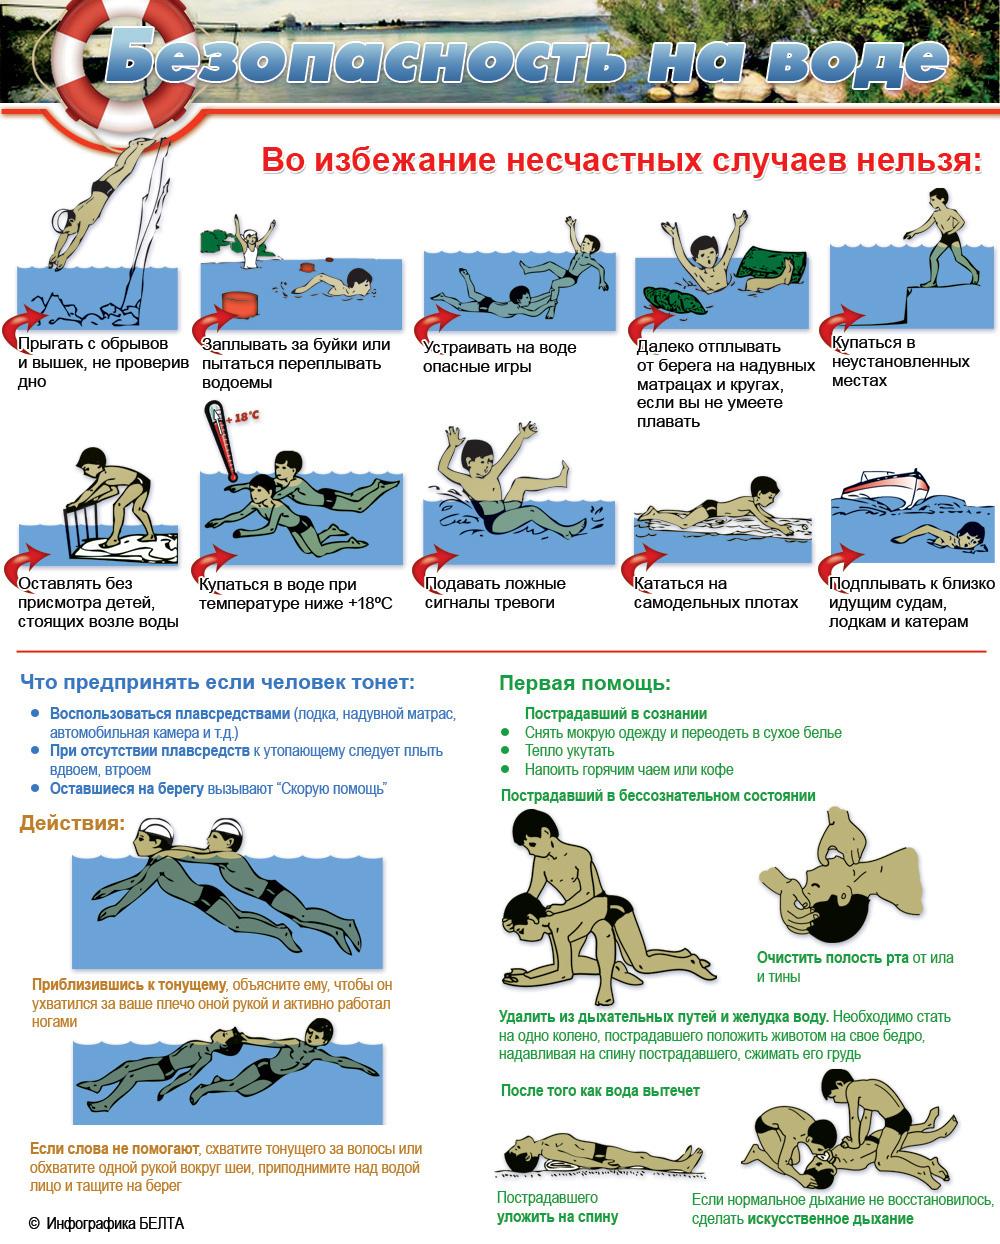 http://92s.ru/wp-content/uploads/2014/07/000325_262866_Infografika.jpg